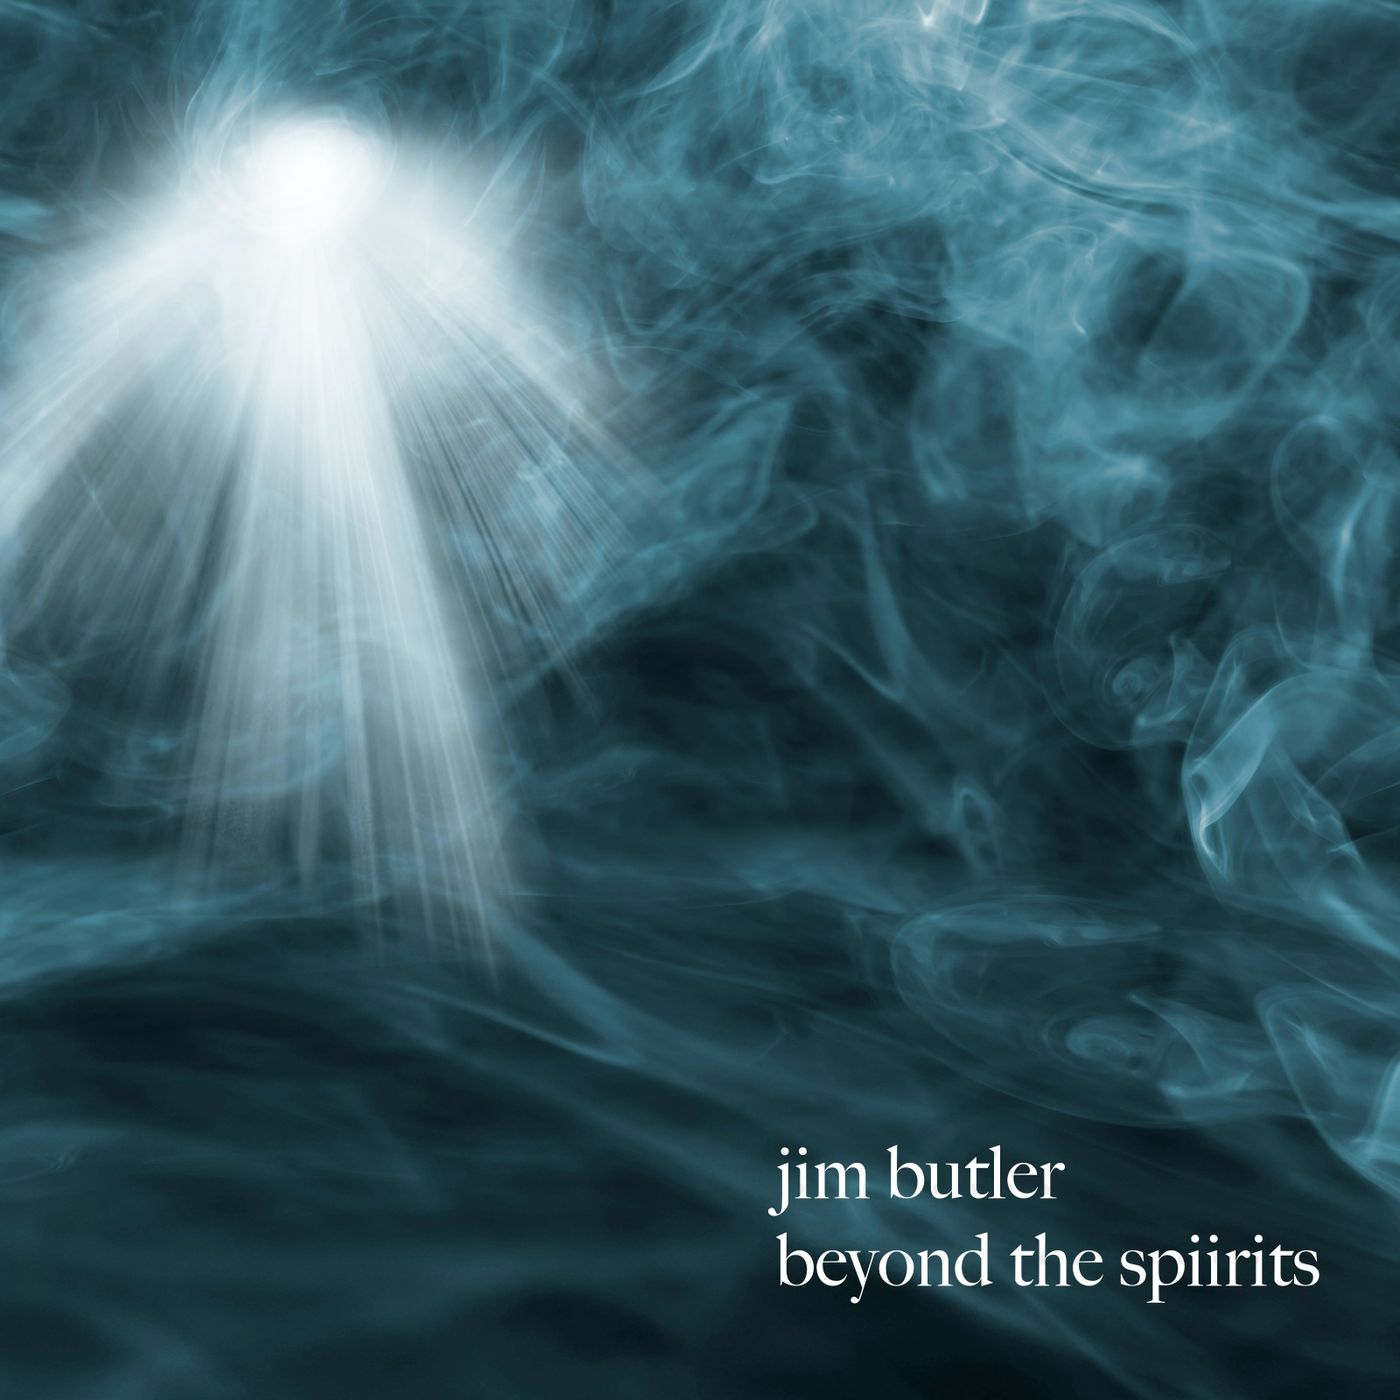 Deep Energy 311 - Beyond the Spirits - Music for Sleep, Meditation, Relaxation, Massage, Yoga, Reiki, Sound Healing and Therapy